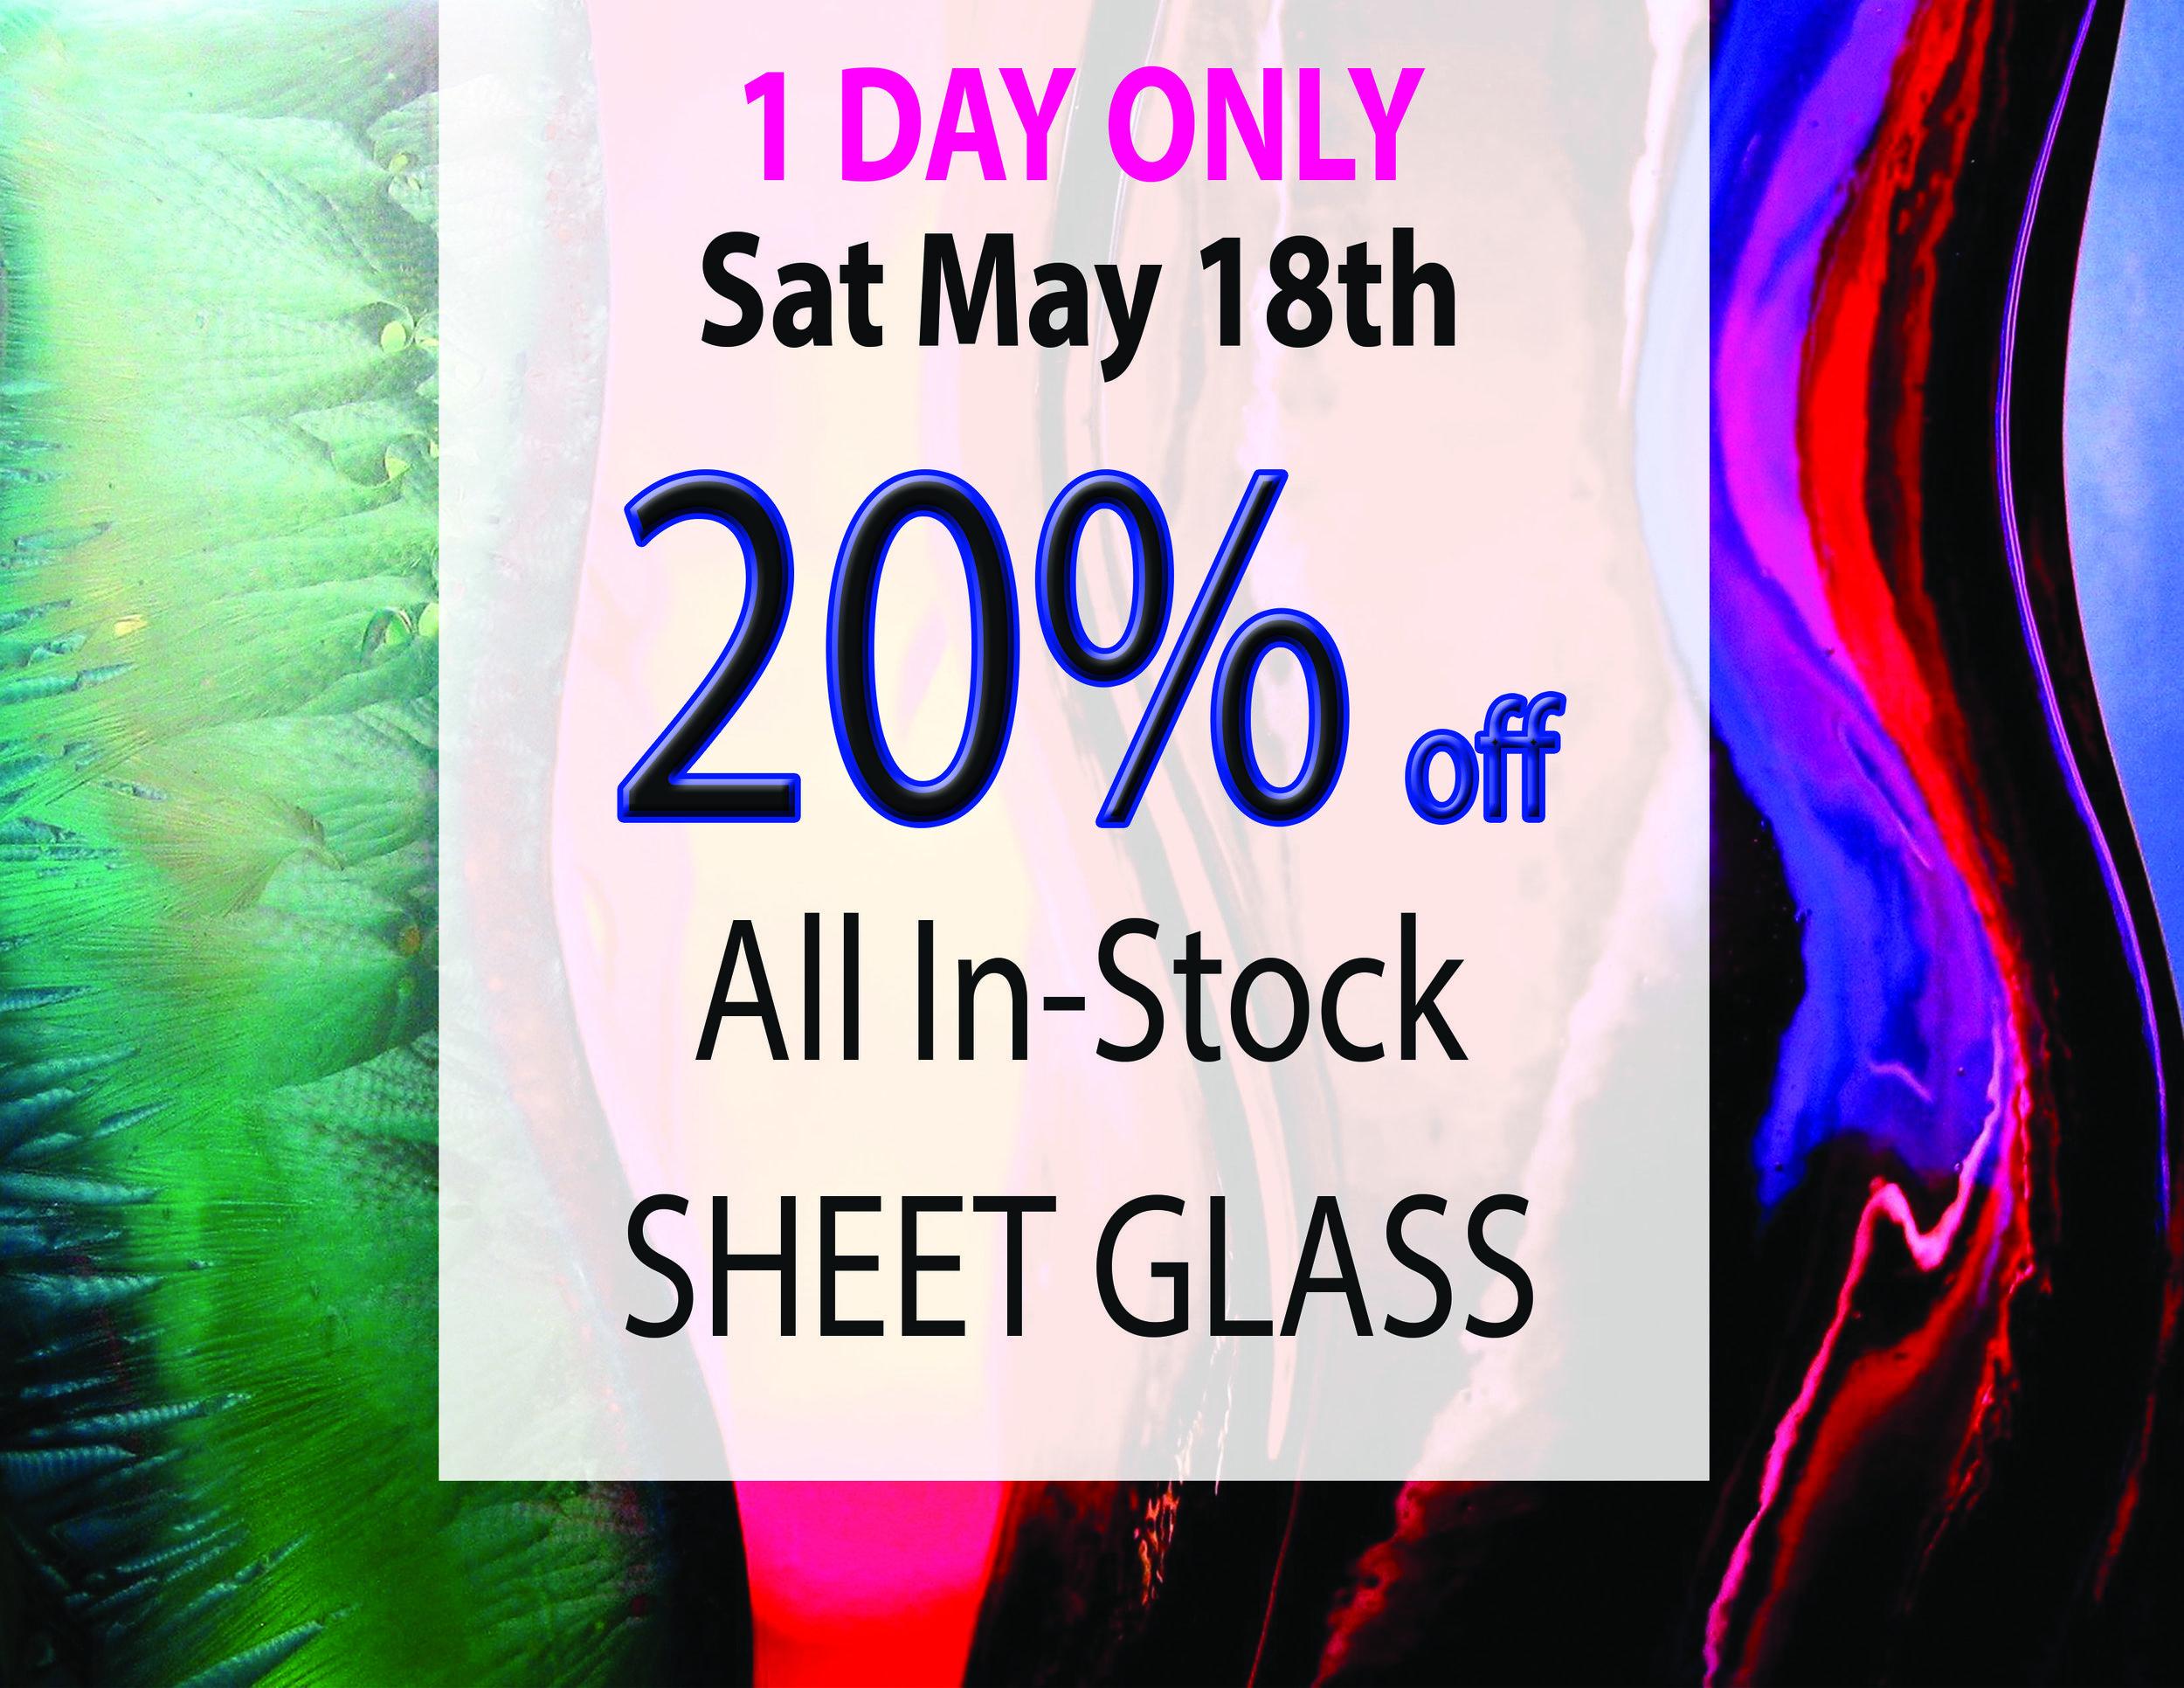 1 day glass sale.jpg